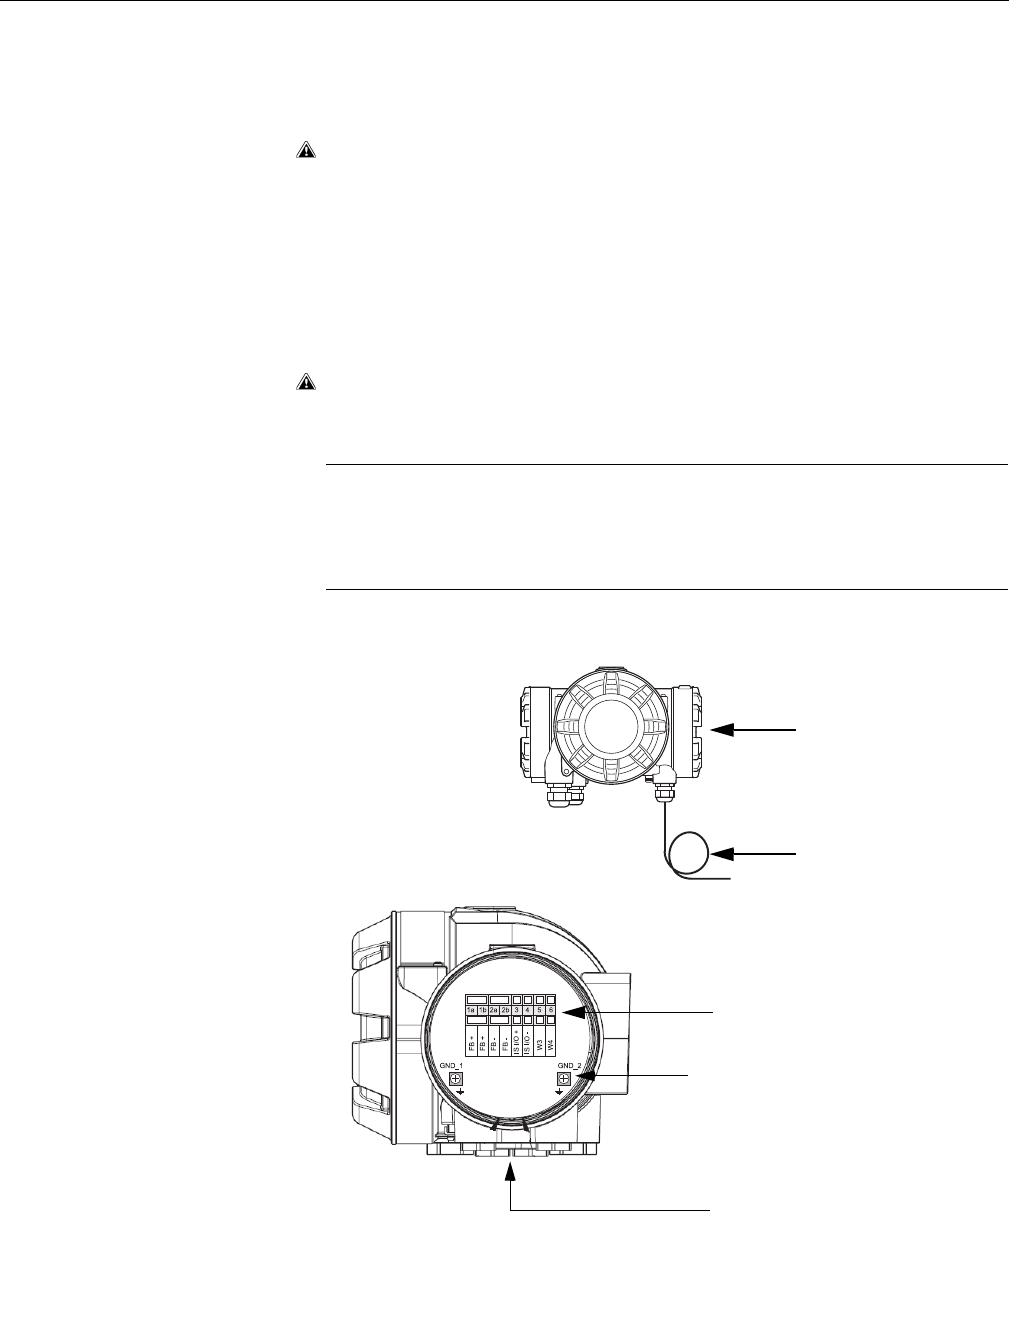 Emerson Process Management Rosemount 2410 3.4.12 IS Connection